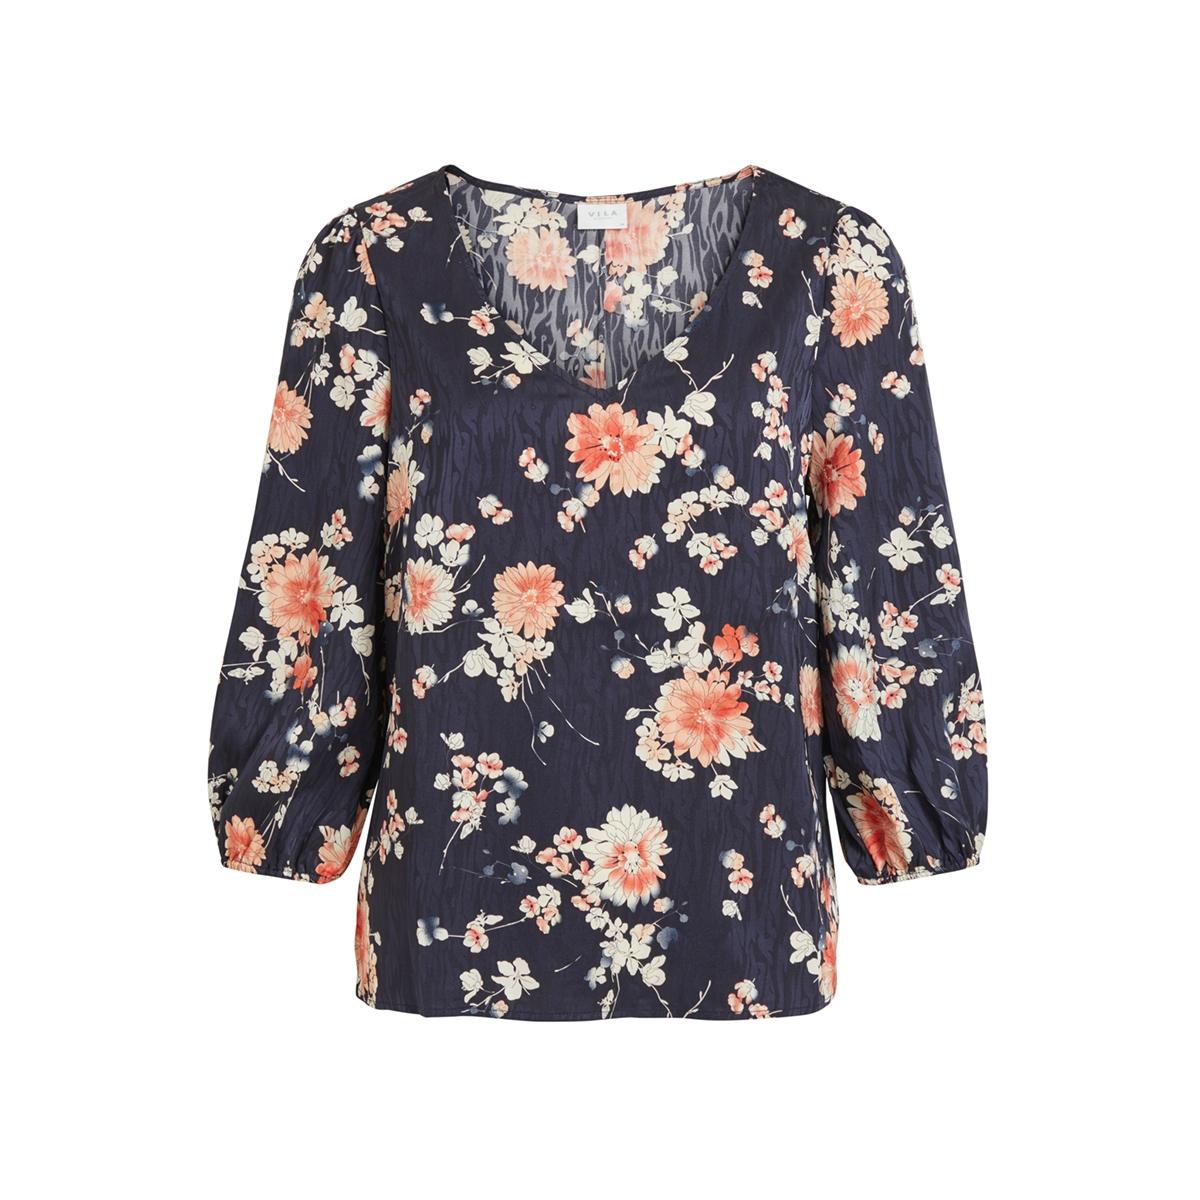 viwilla 3/4 v-neck top/l 14059184 vila t-shirt navy blazers/flowers